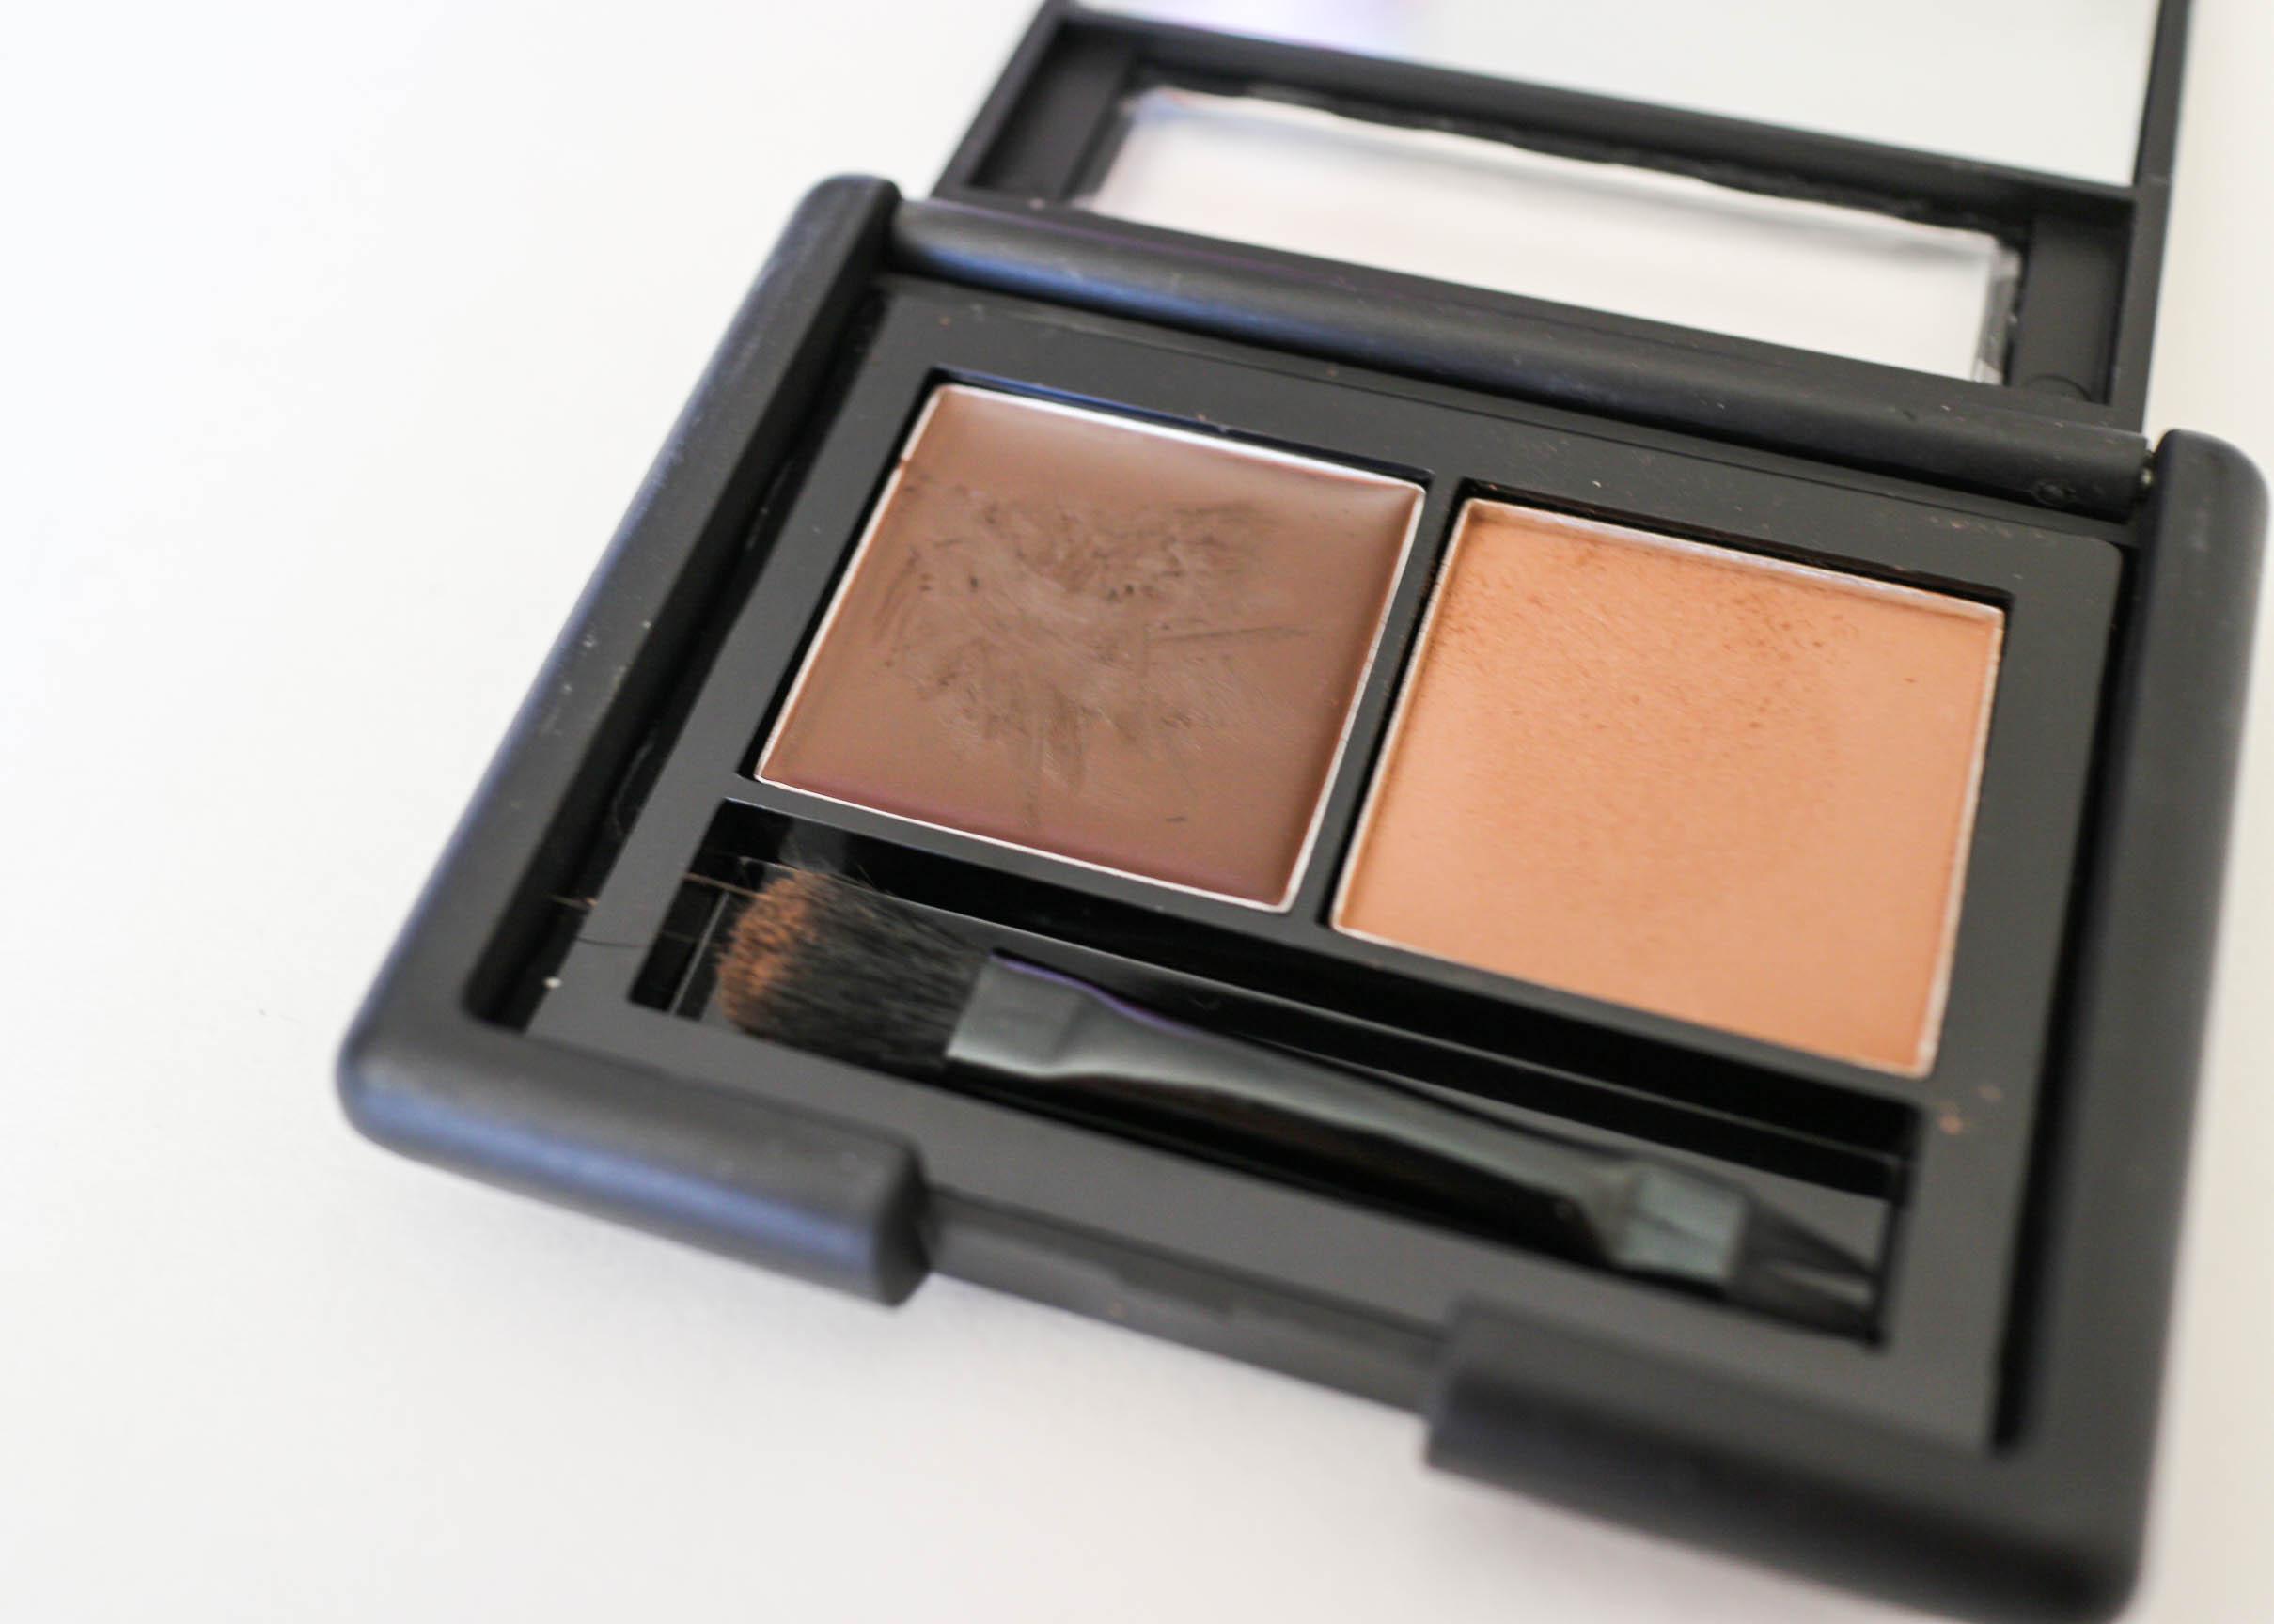 Review Elf Studio Eyebrow Kit In Medium Moscato Mascara